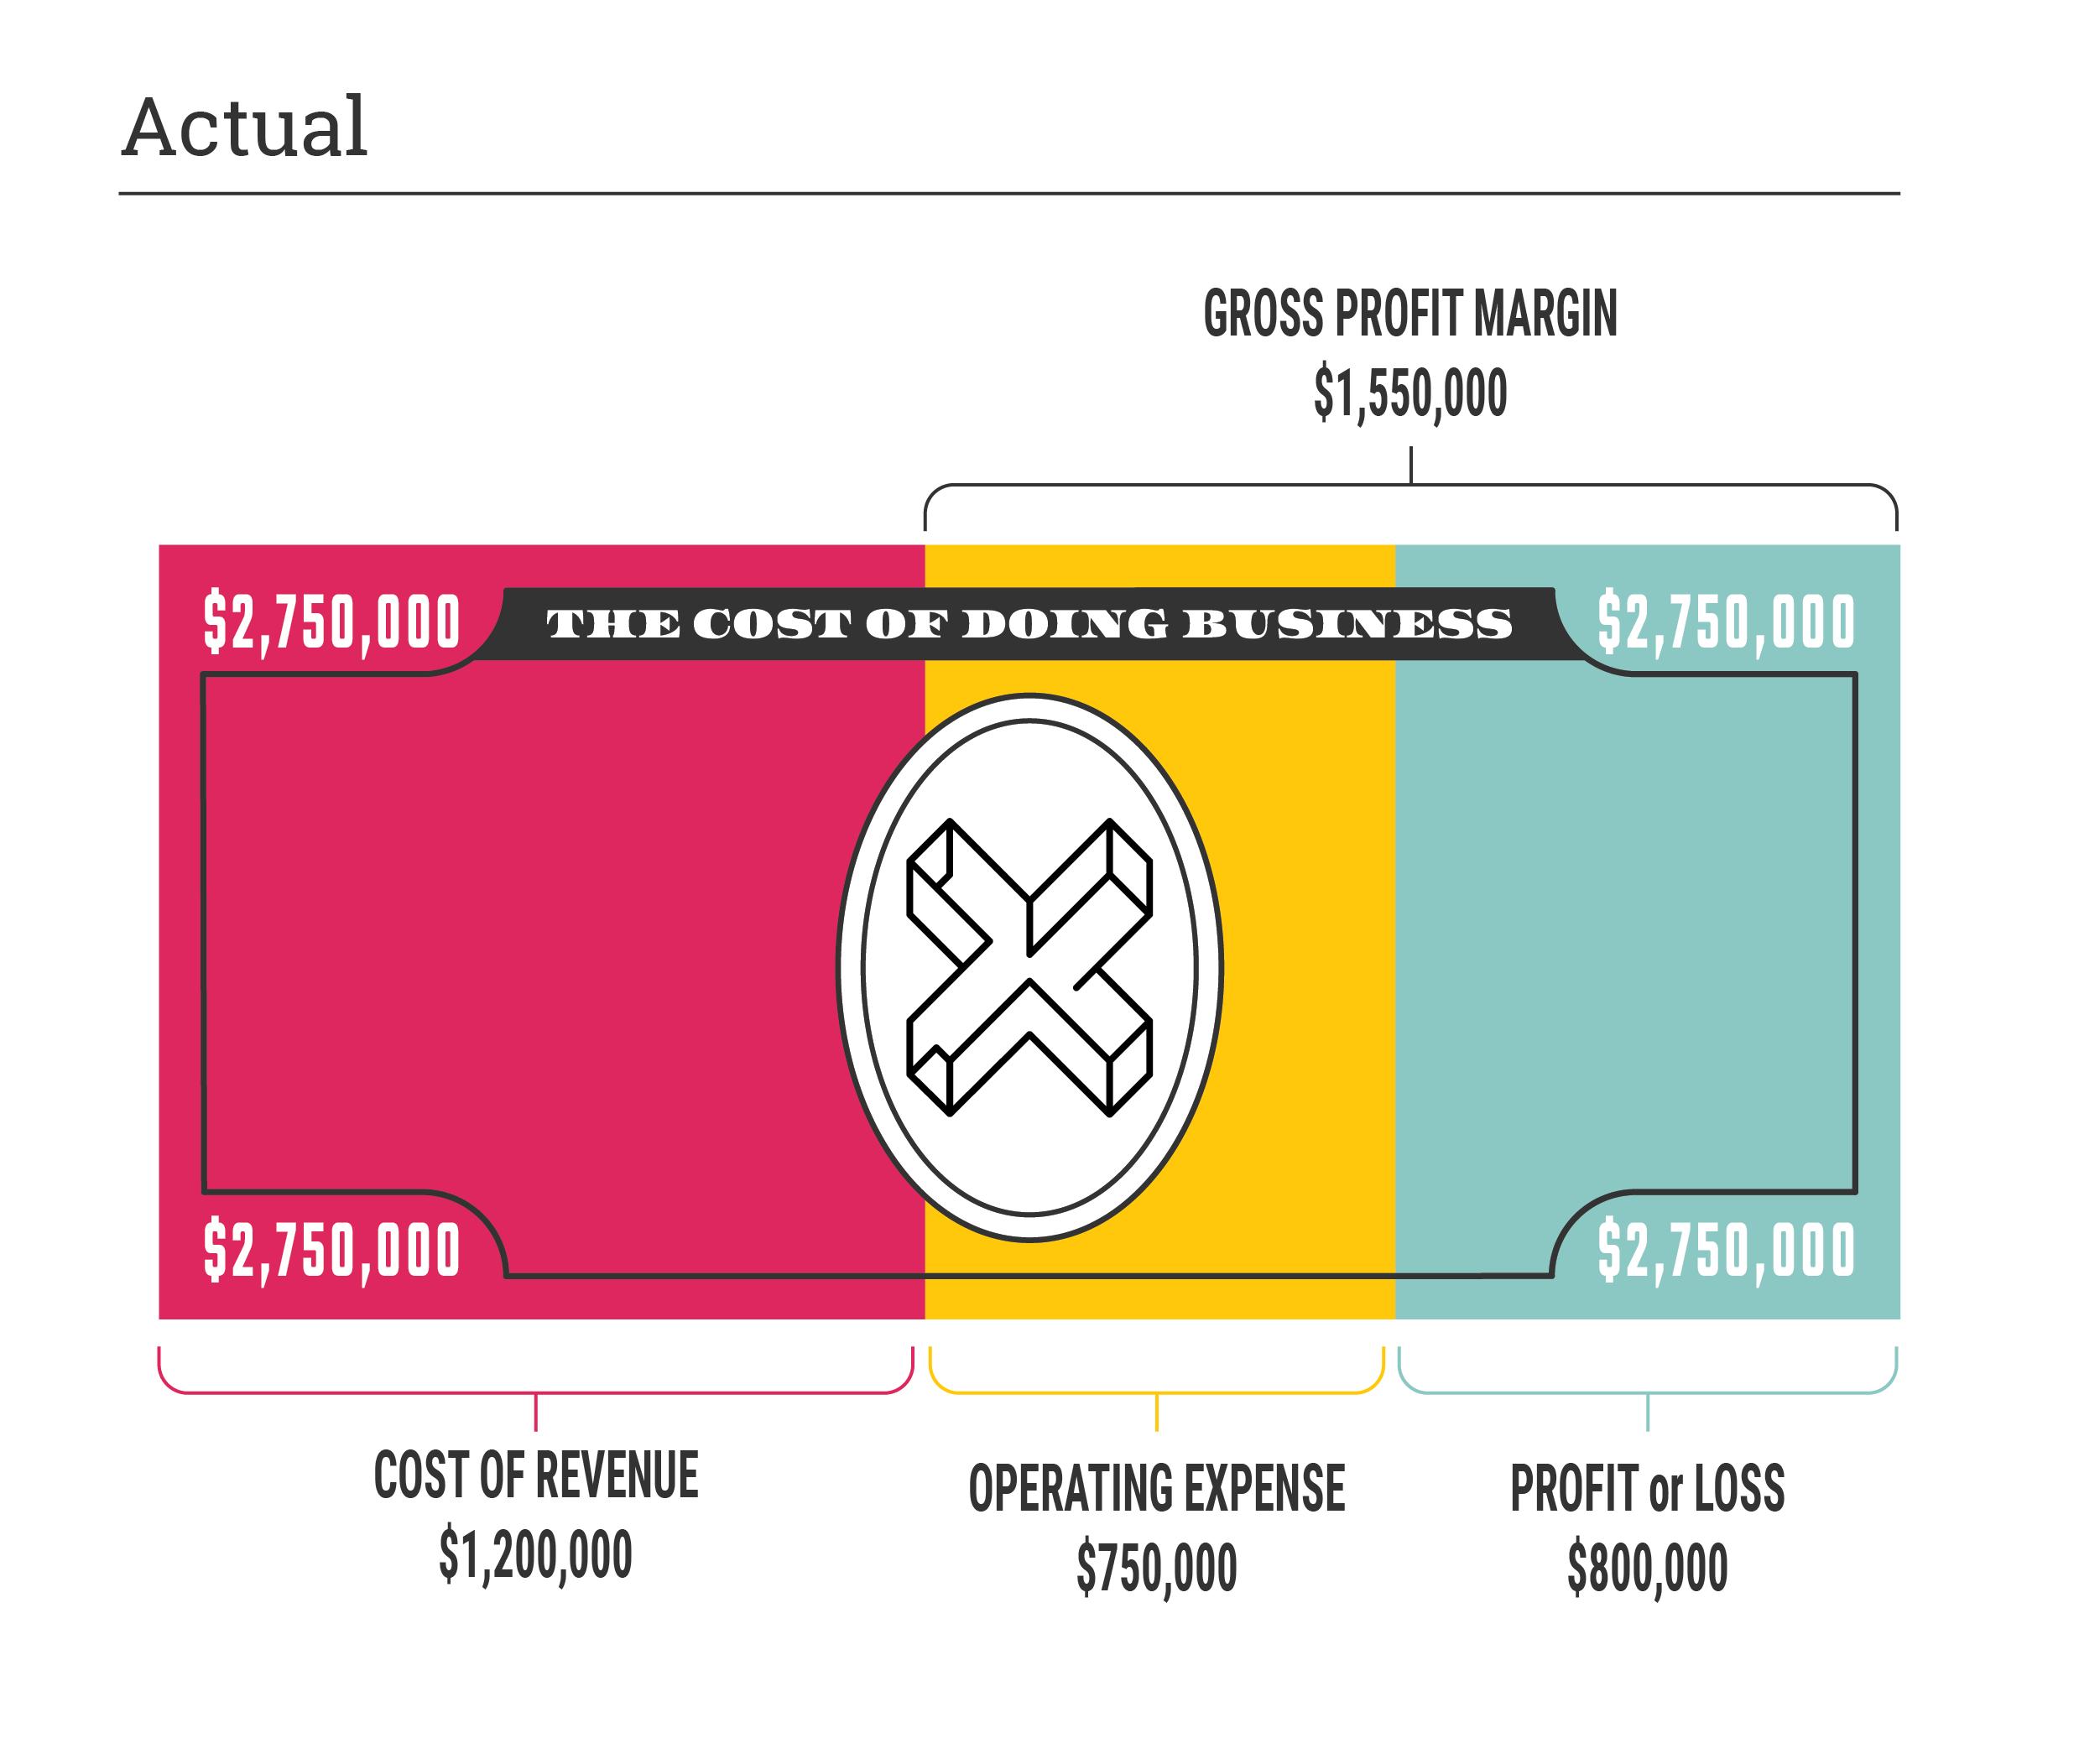 XPL-Actual-graphic